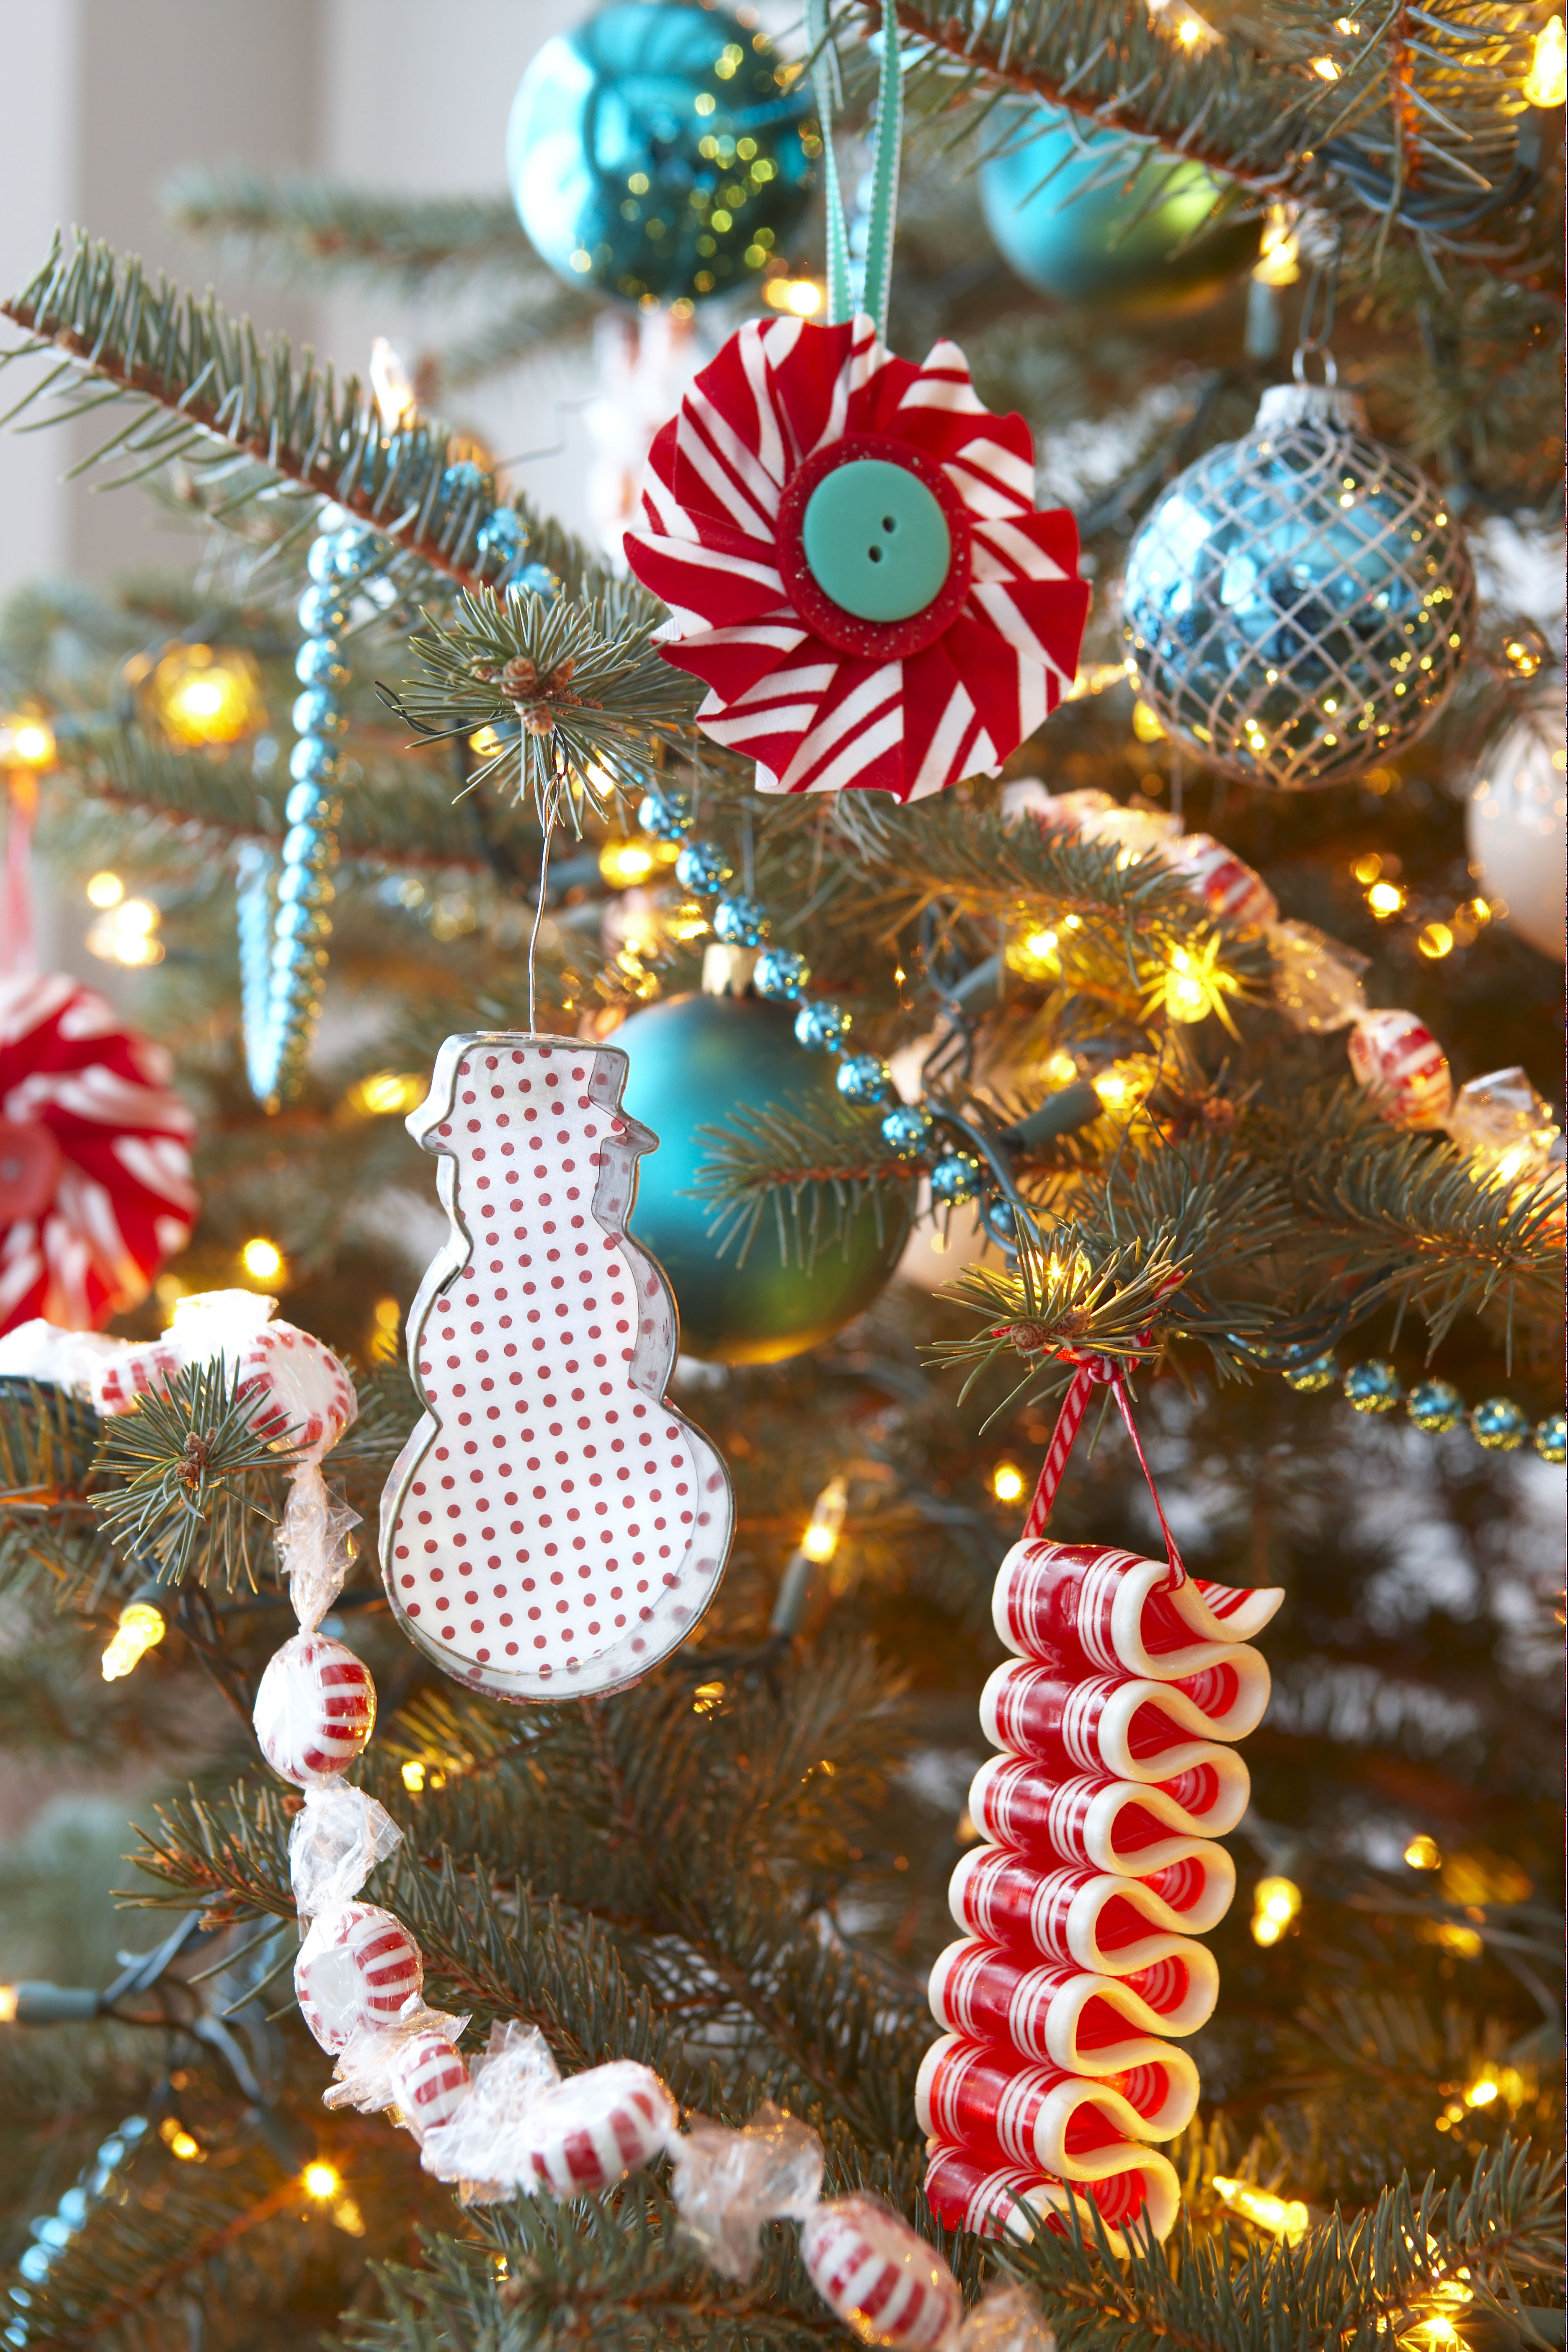 52 homemade christmas ornaments diy handmade holiday tree 52 homemade christmas ornaments diy handmade holiday tree ornament craft ideas solutioingenieria Gallery